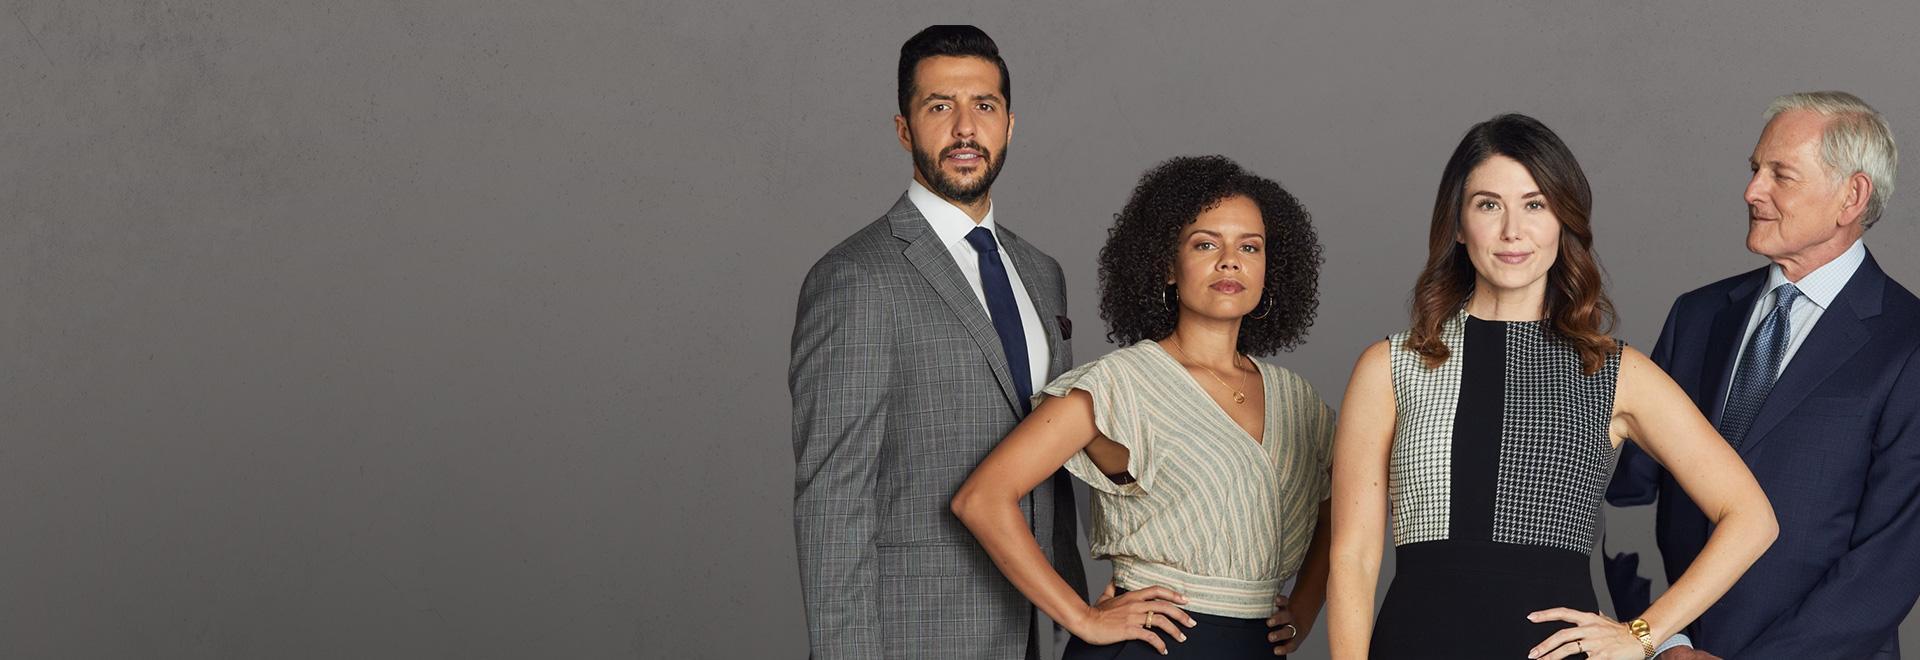 Avvocati di famiglia